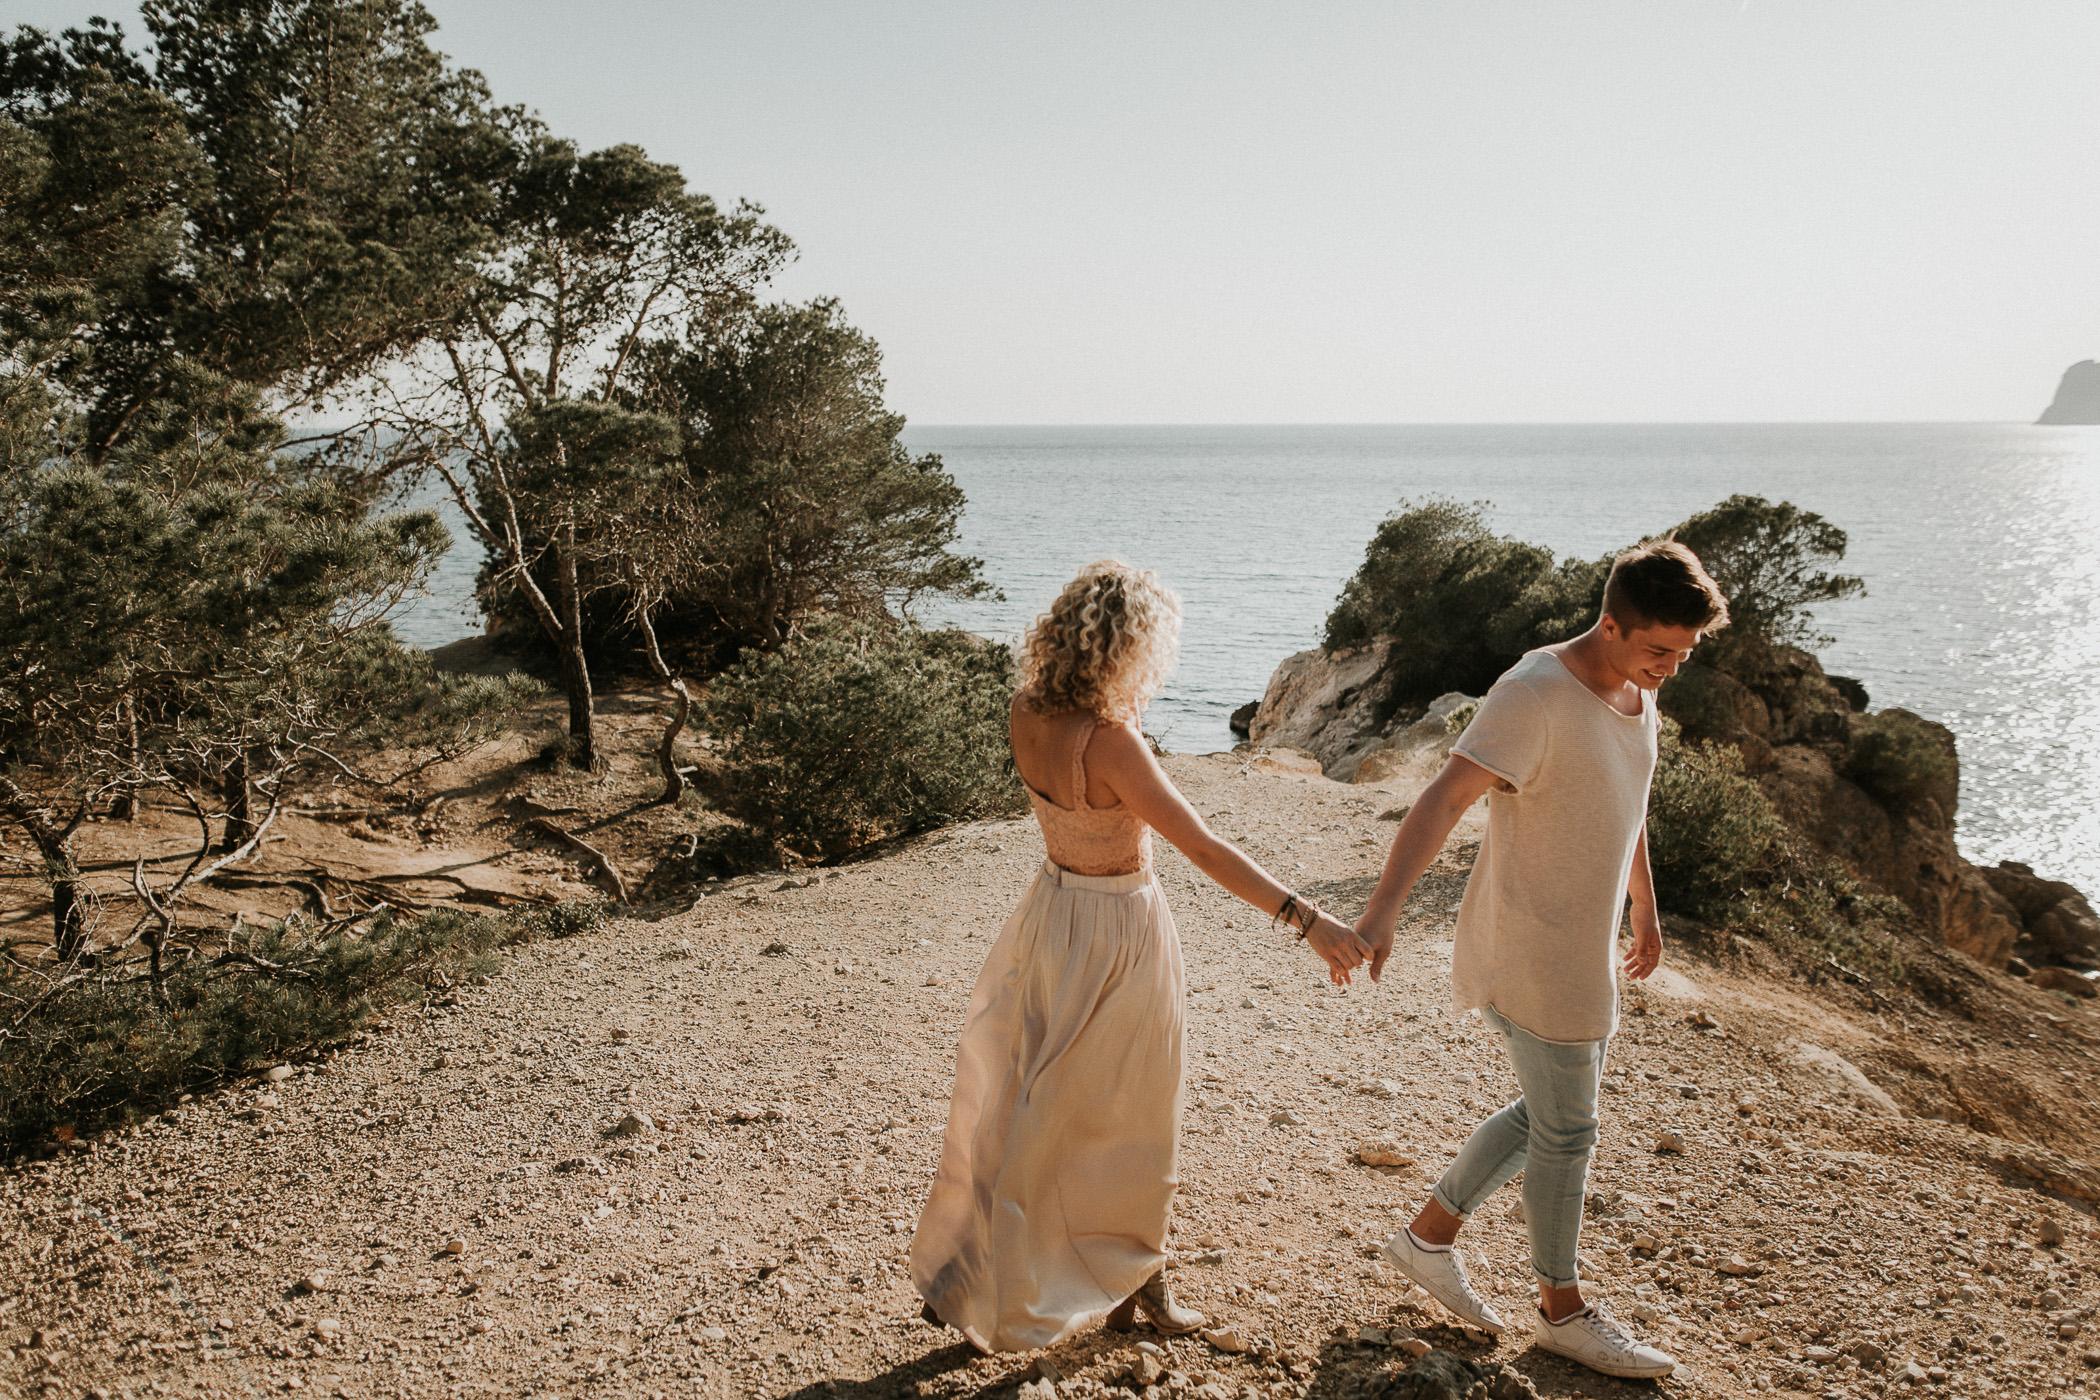 DanielaMarquardtPhotography_elopement_mallorca_spain_paguera_palma_charlyandbela_2